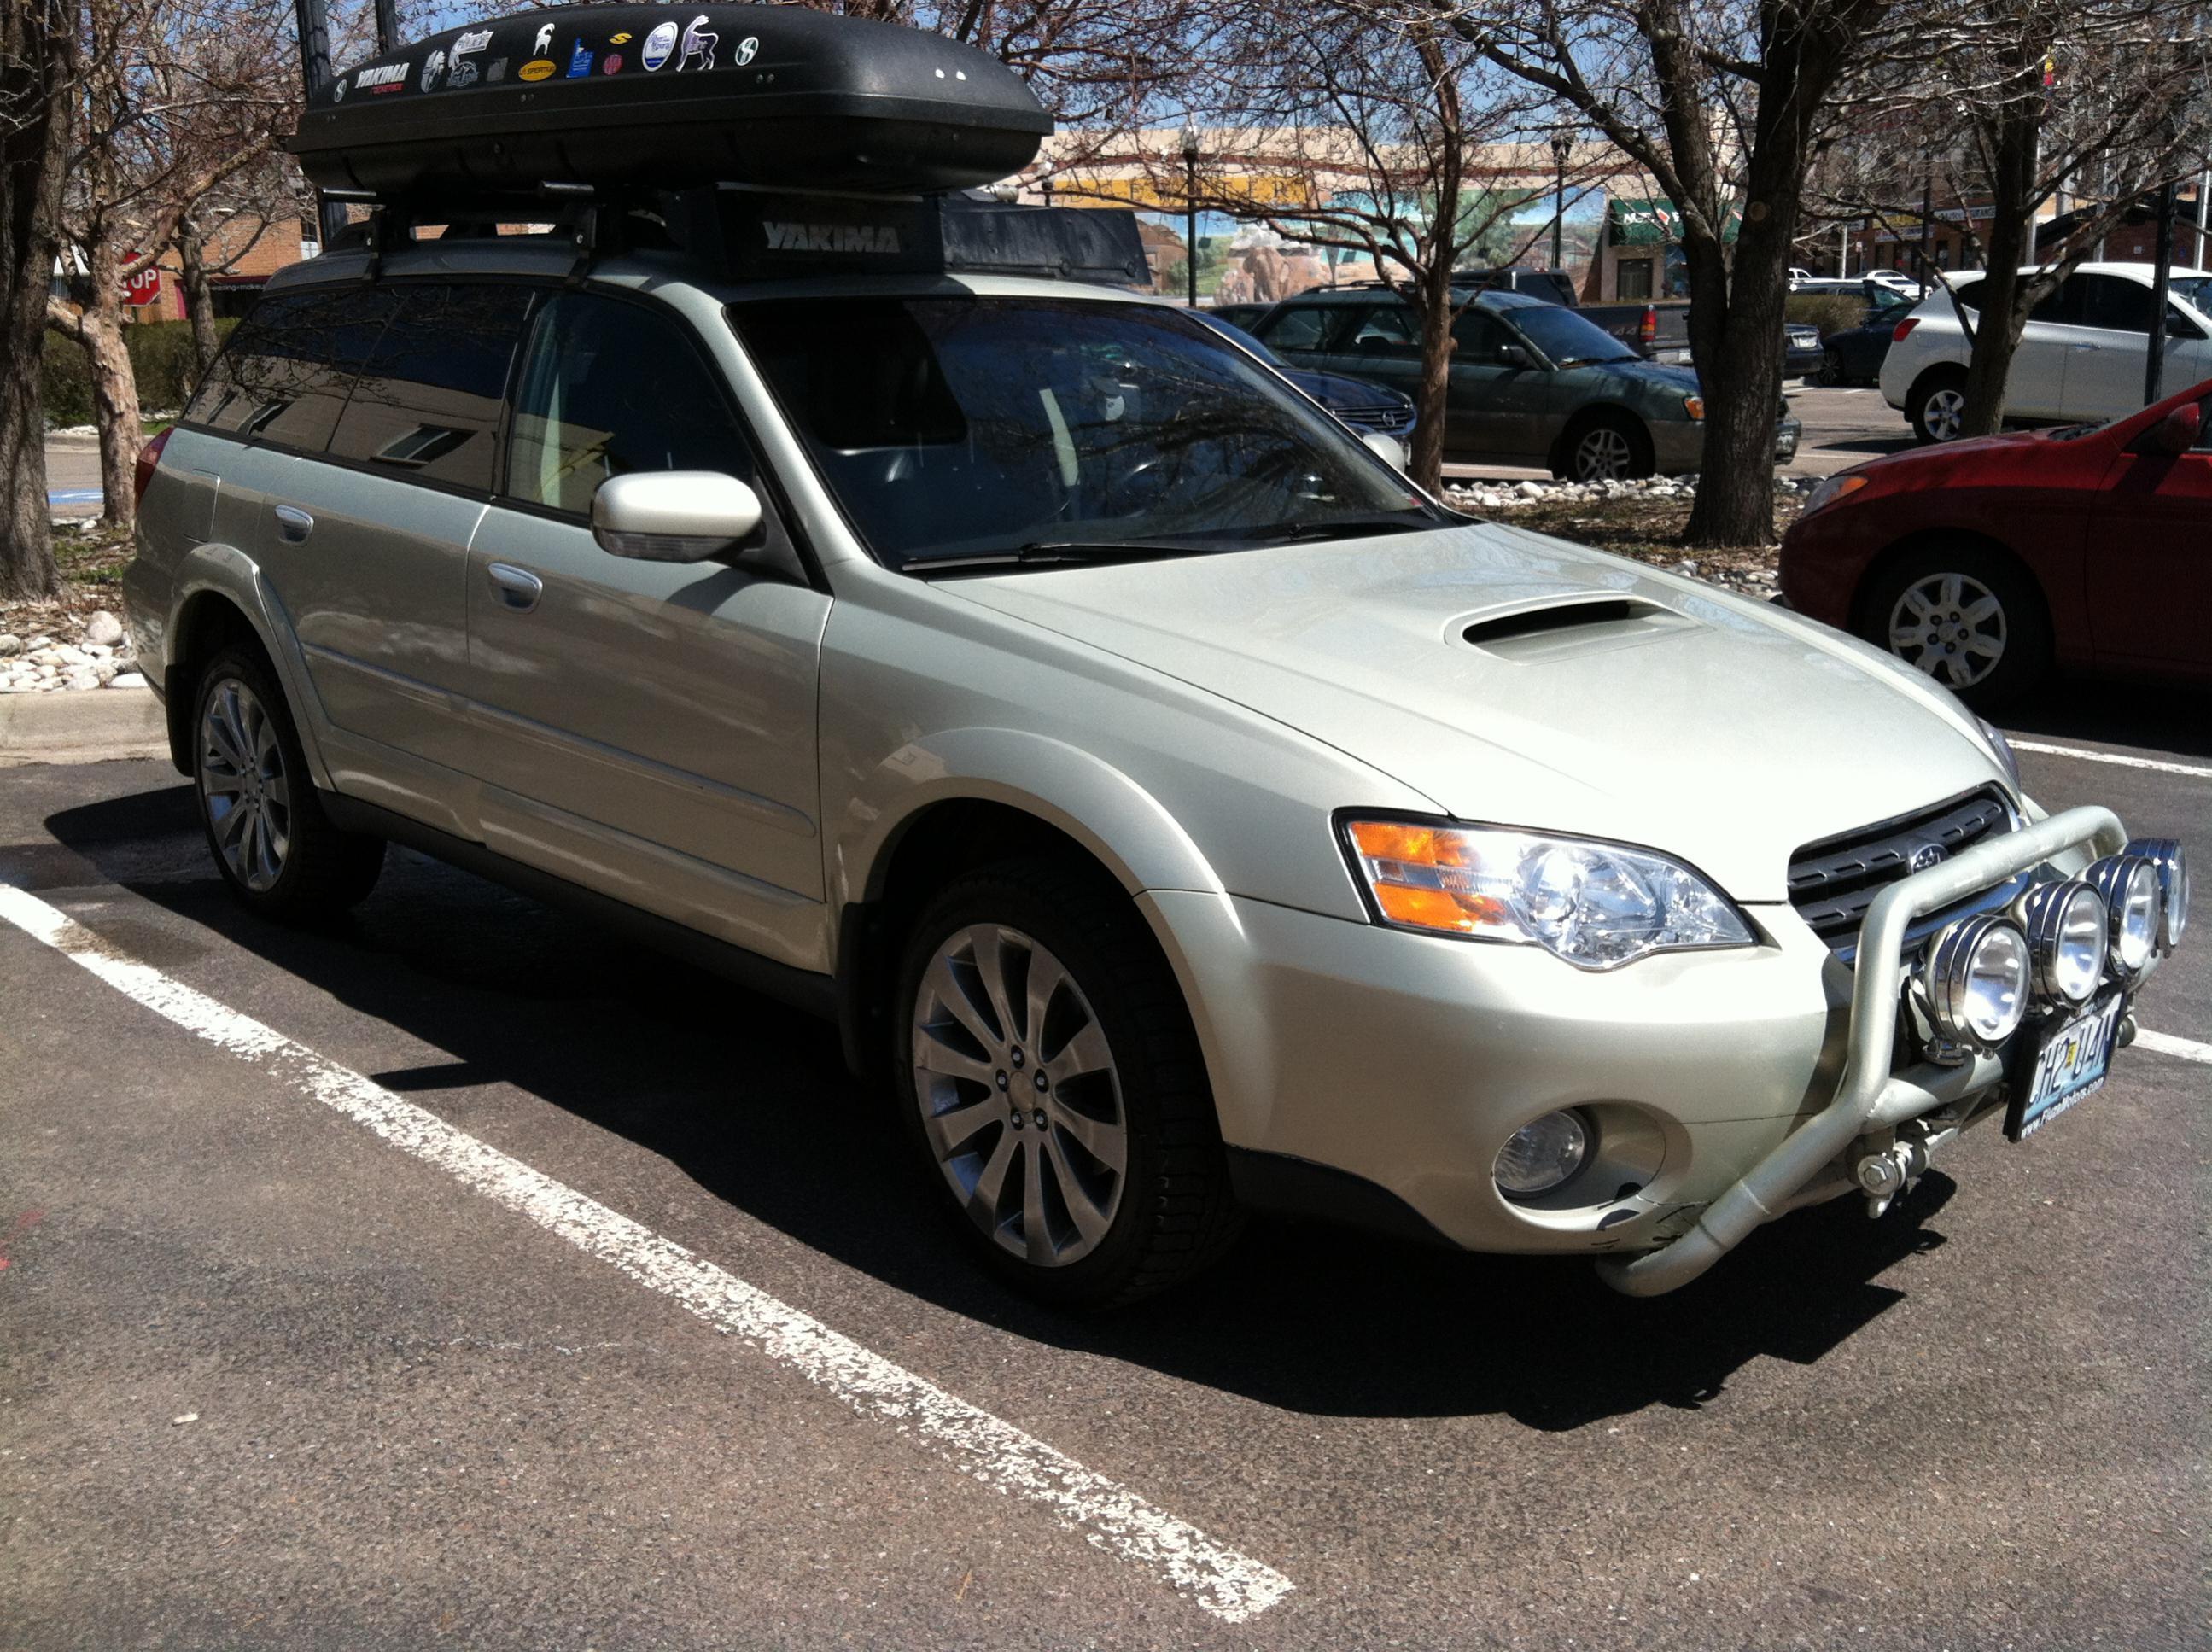 Subaru Outback Accessories >> Bull bars for Subarus - Page 3 - Subaru Outback - Subaru ...